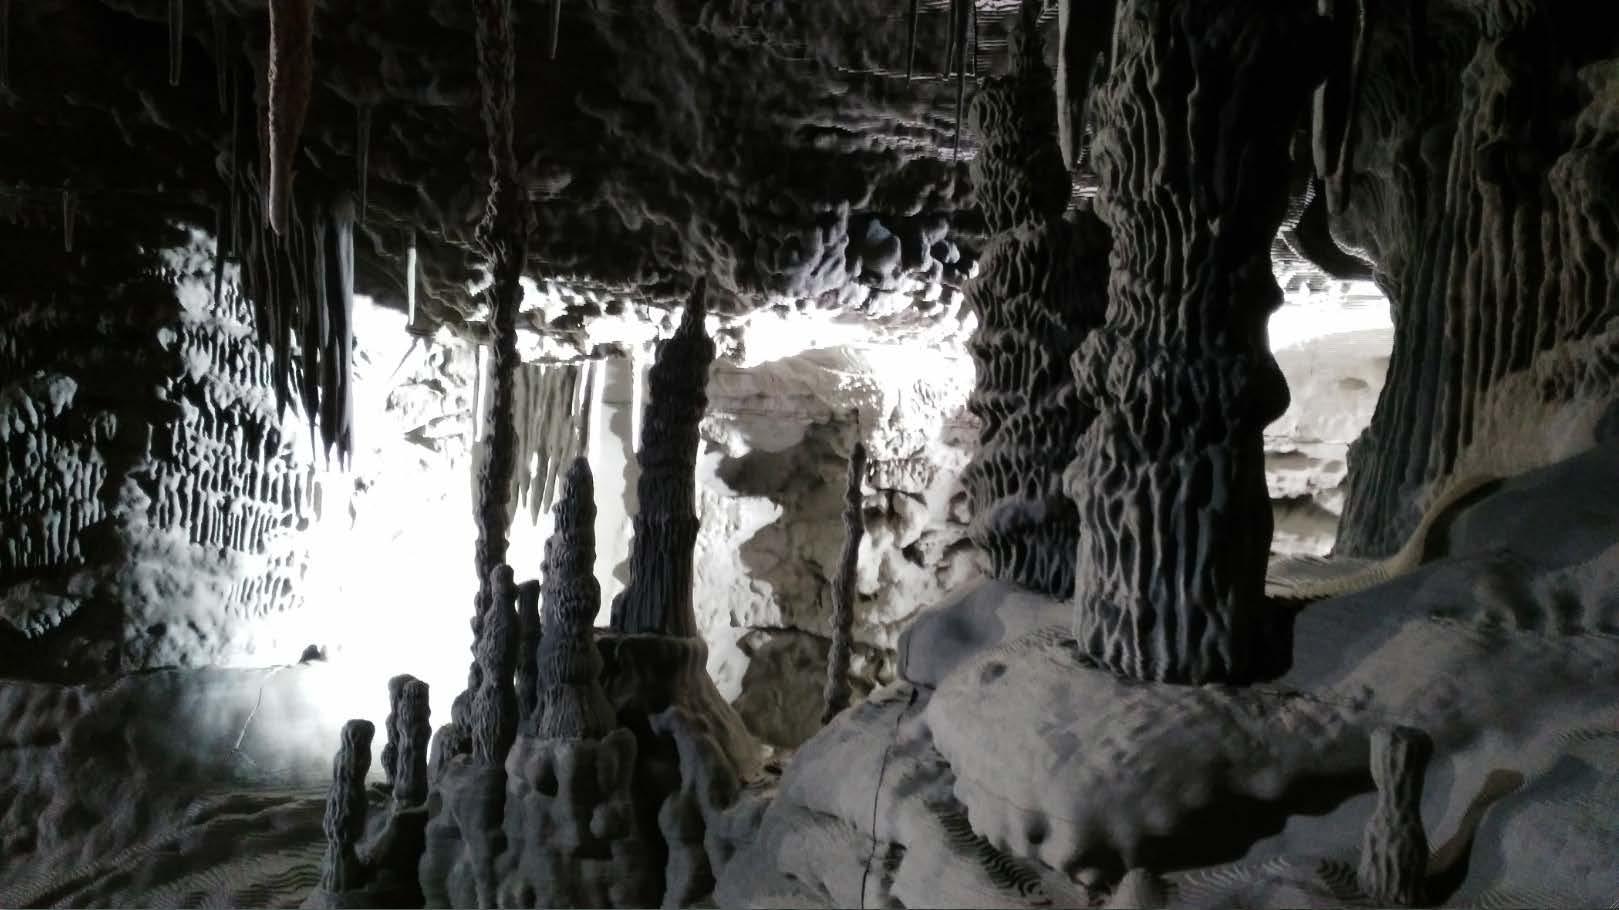 18.jpgL'Armonia degli opposti: la fondazione Prada_grotta_MilanoPlatinum